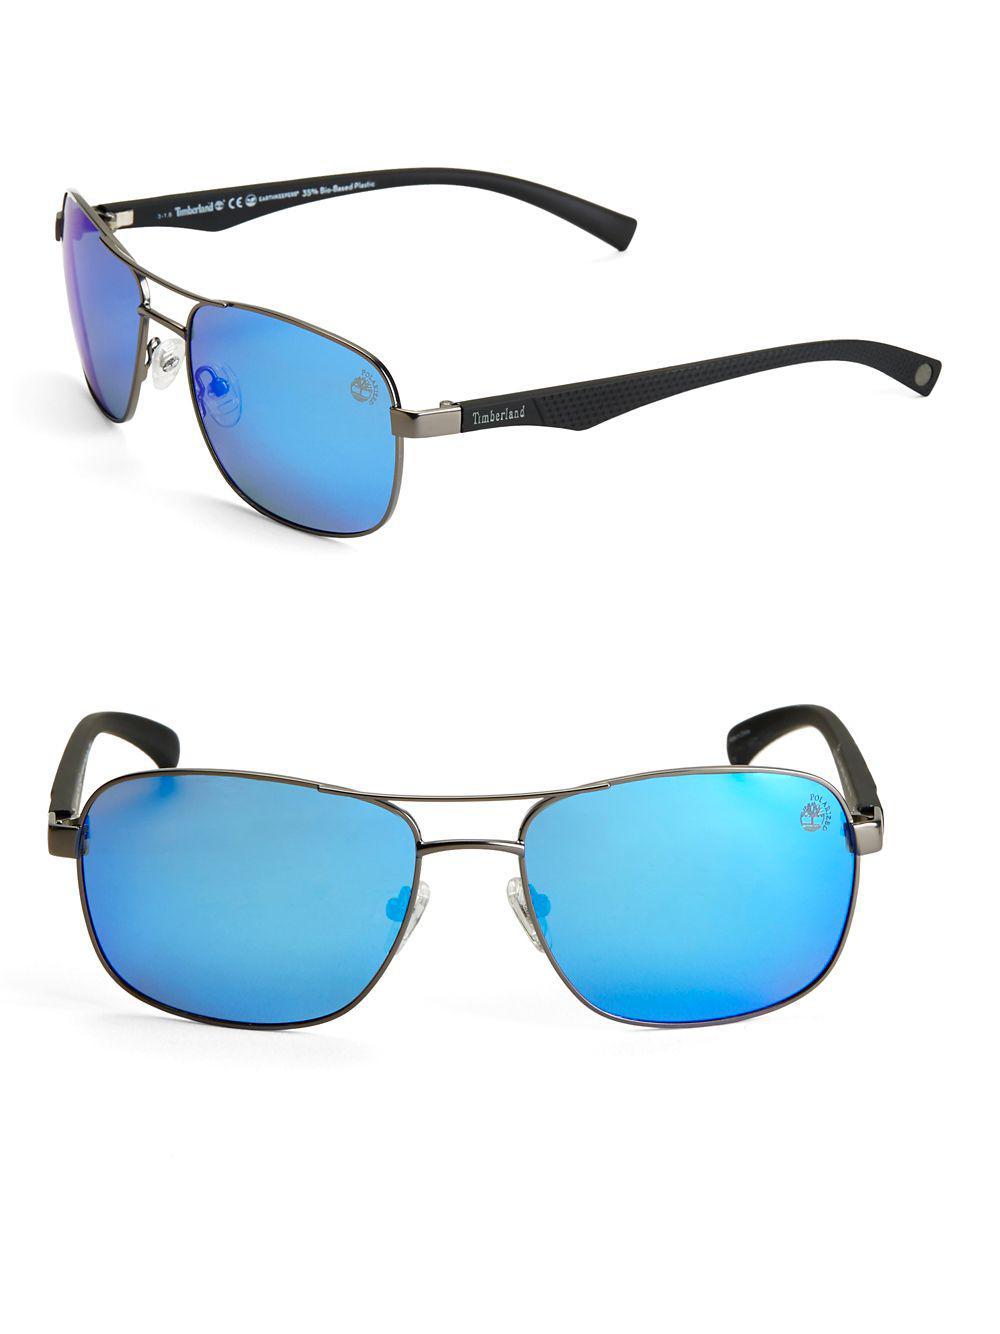 c615d3344e Timberland - Blue 59mm Aviator Sunglasses for Men - Lyst. View fullscreen